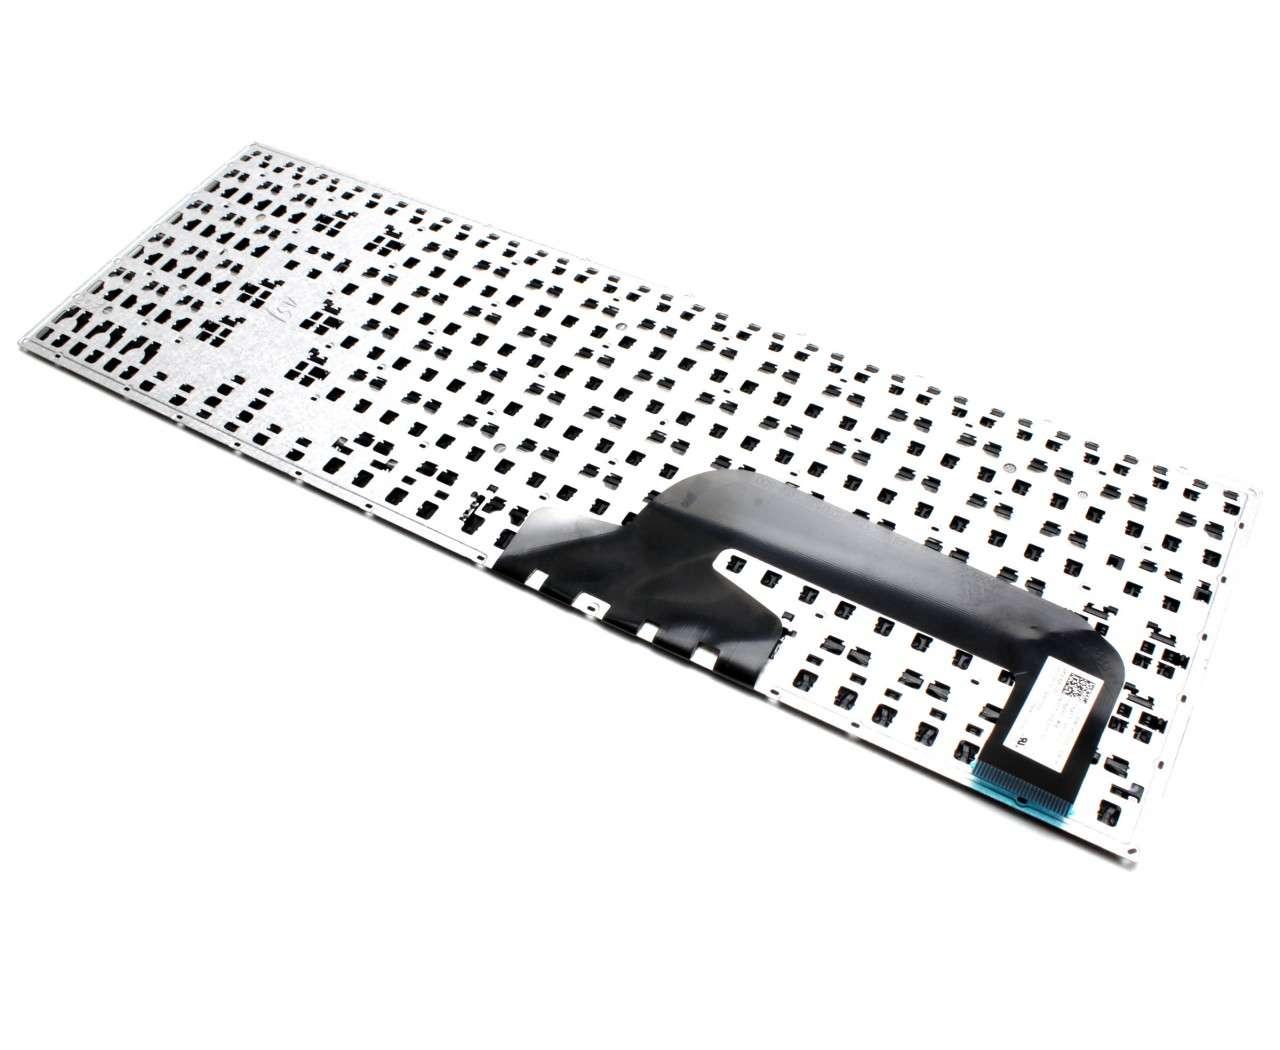 Tastatura Asus ASM17H53US-528 layout US fara rama enter mic imagine